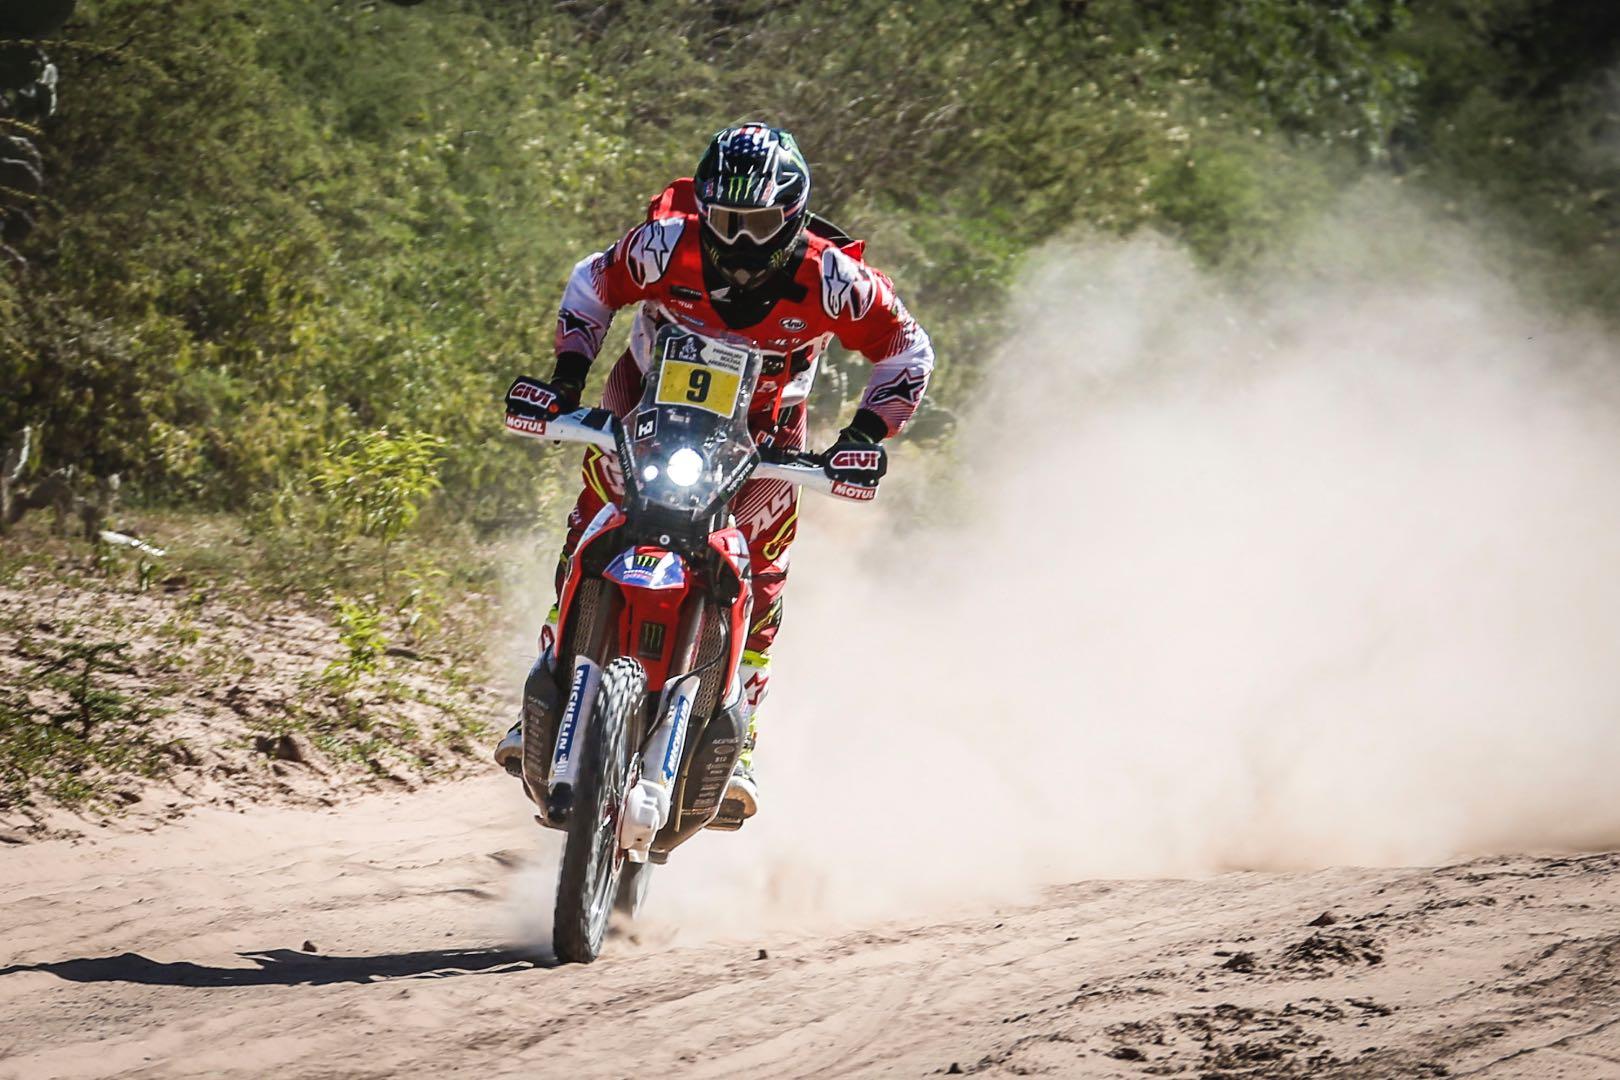 Honda's Ricky Brabec, 2017 Dakar Rally Stage 2